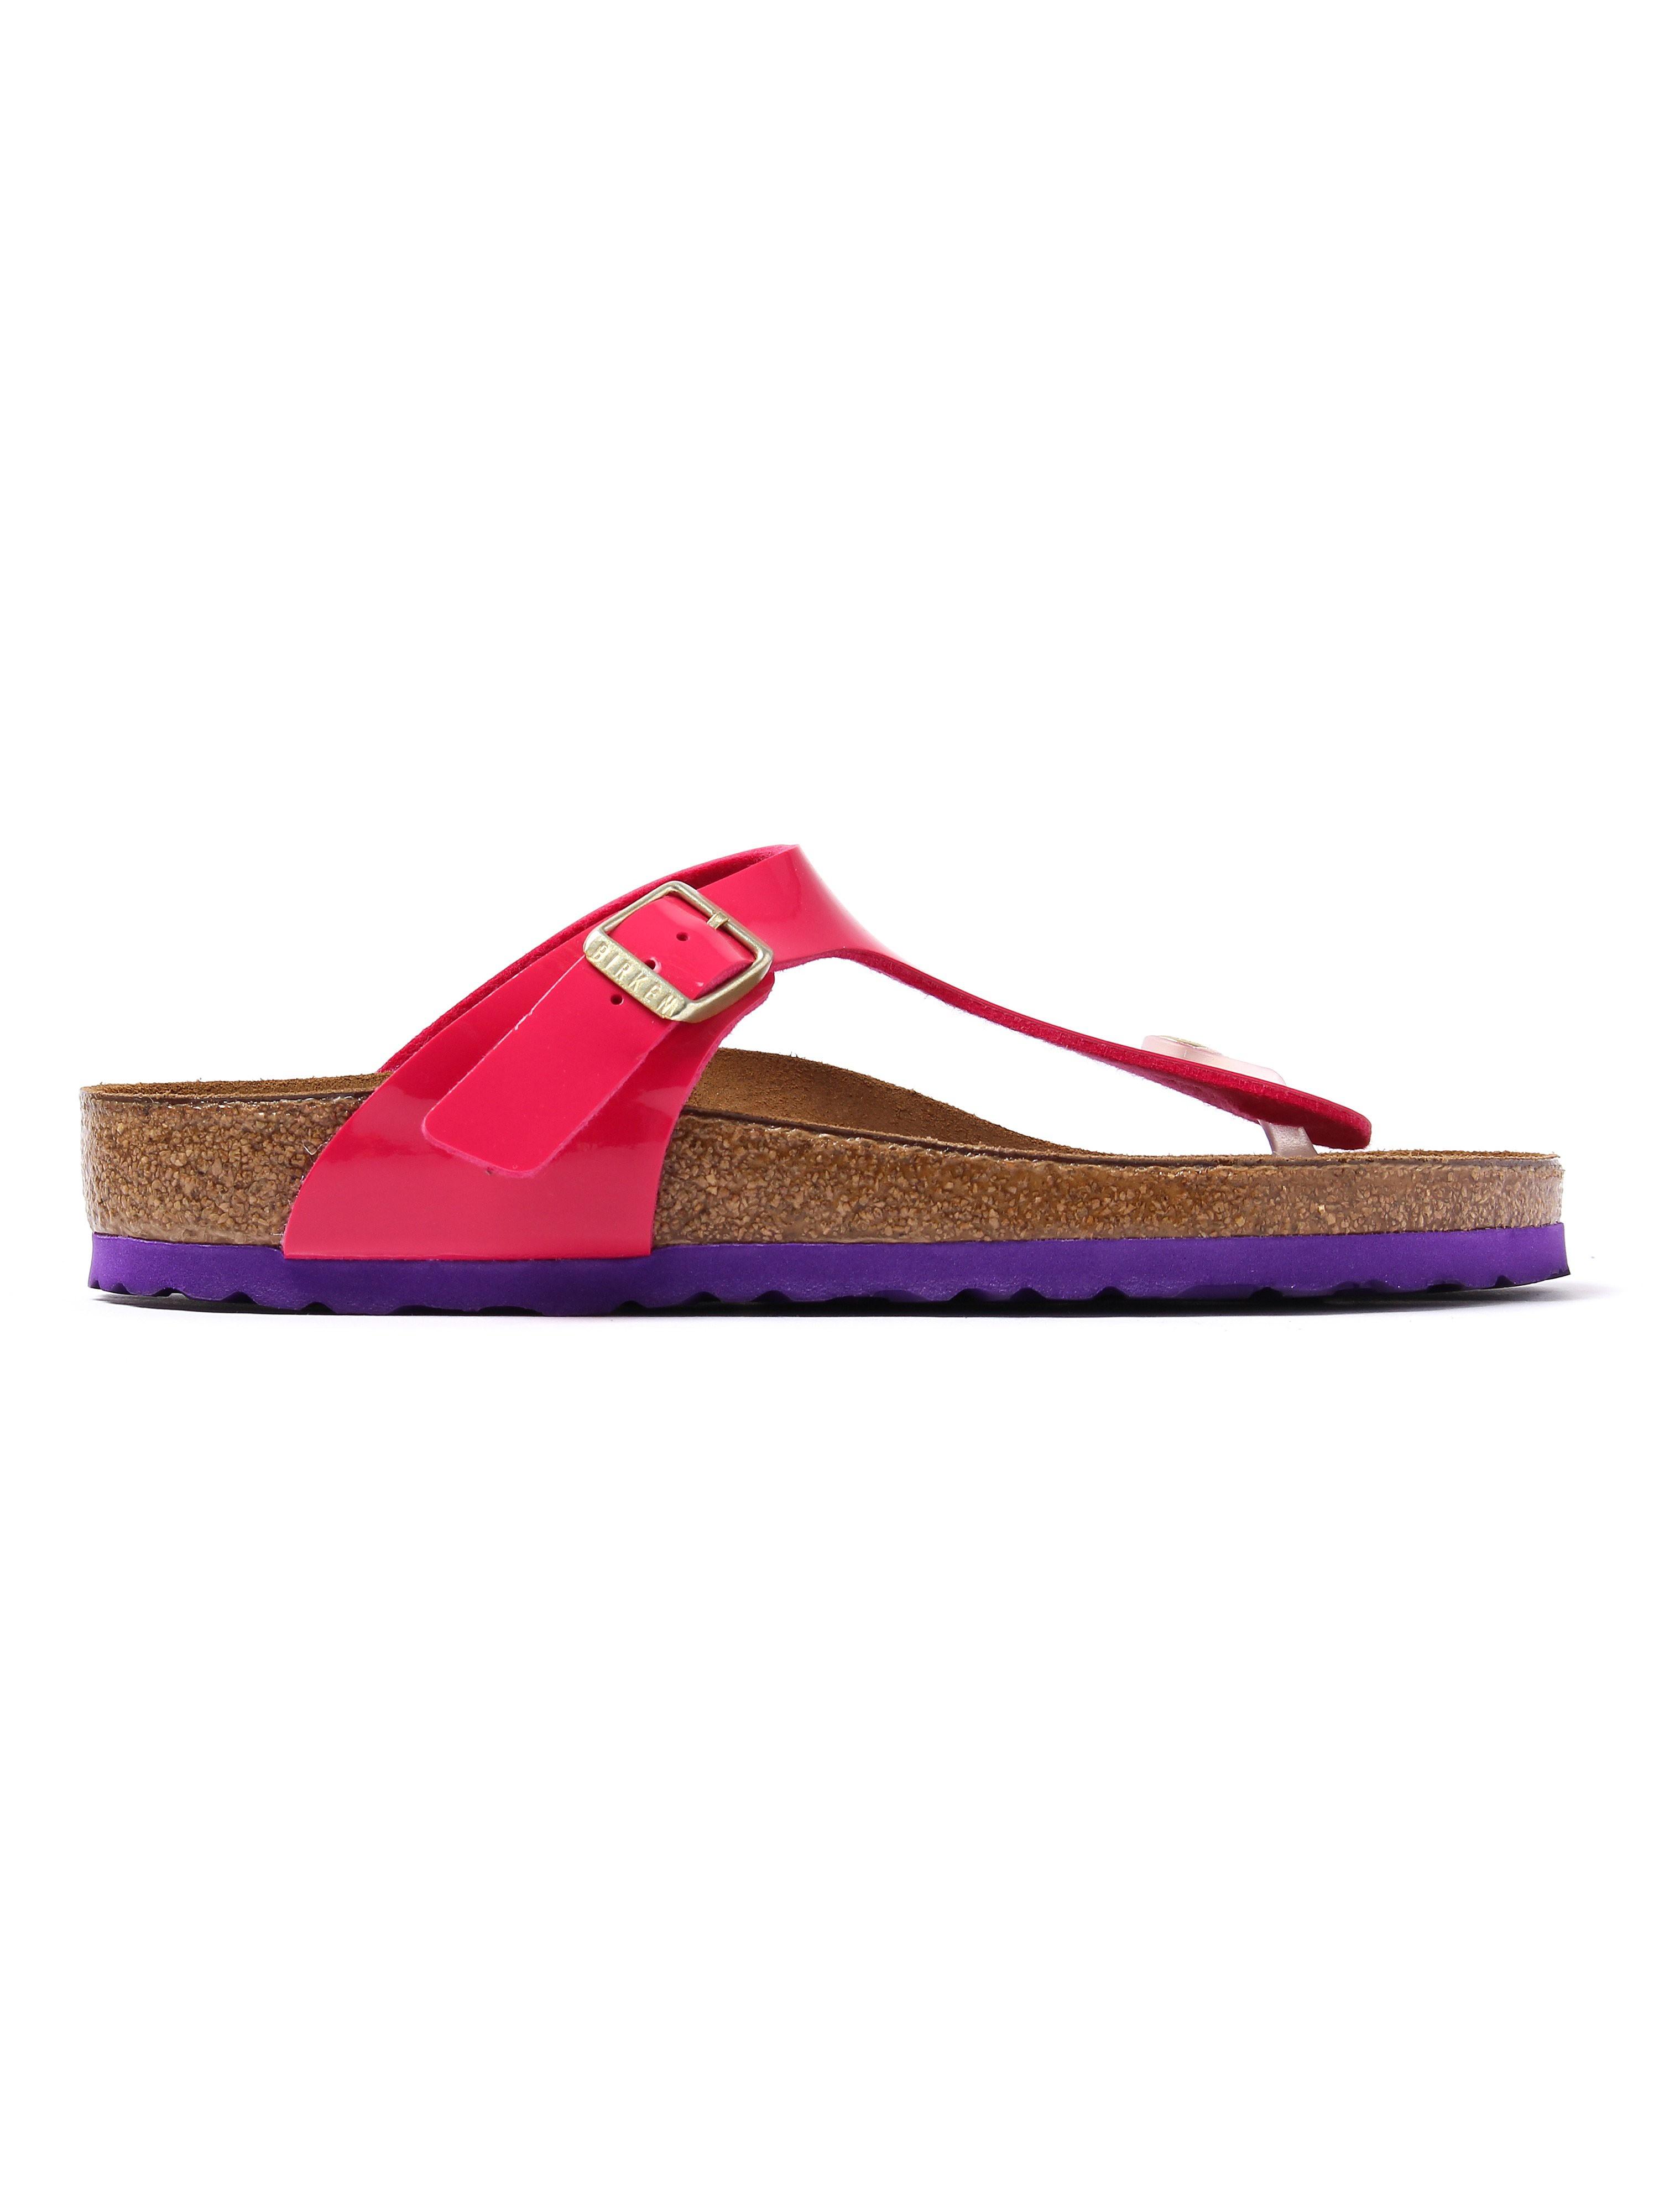 Birkenstock Women's Gizeh Regular Fit Sandals - Pink Patent